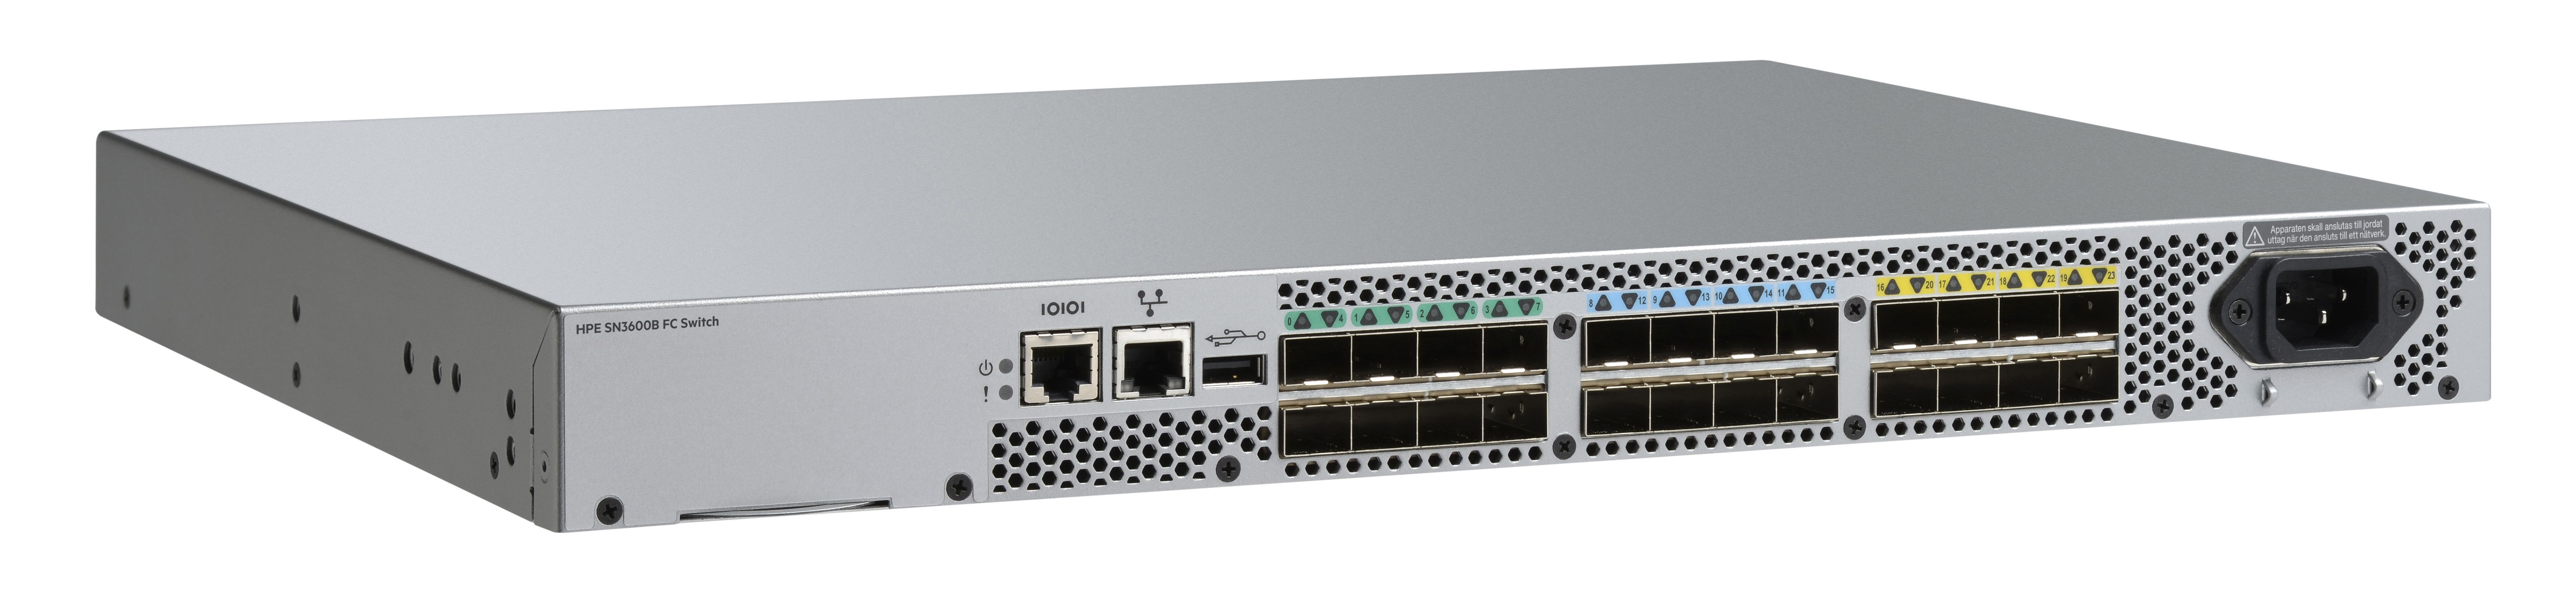 HPE B-series SN3600B FC switch